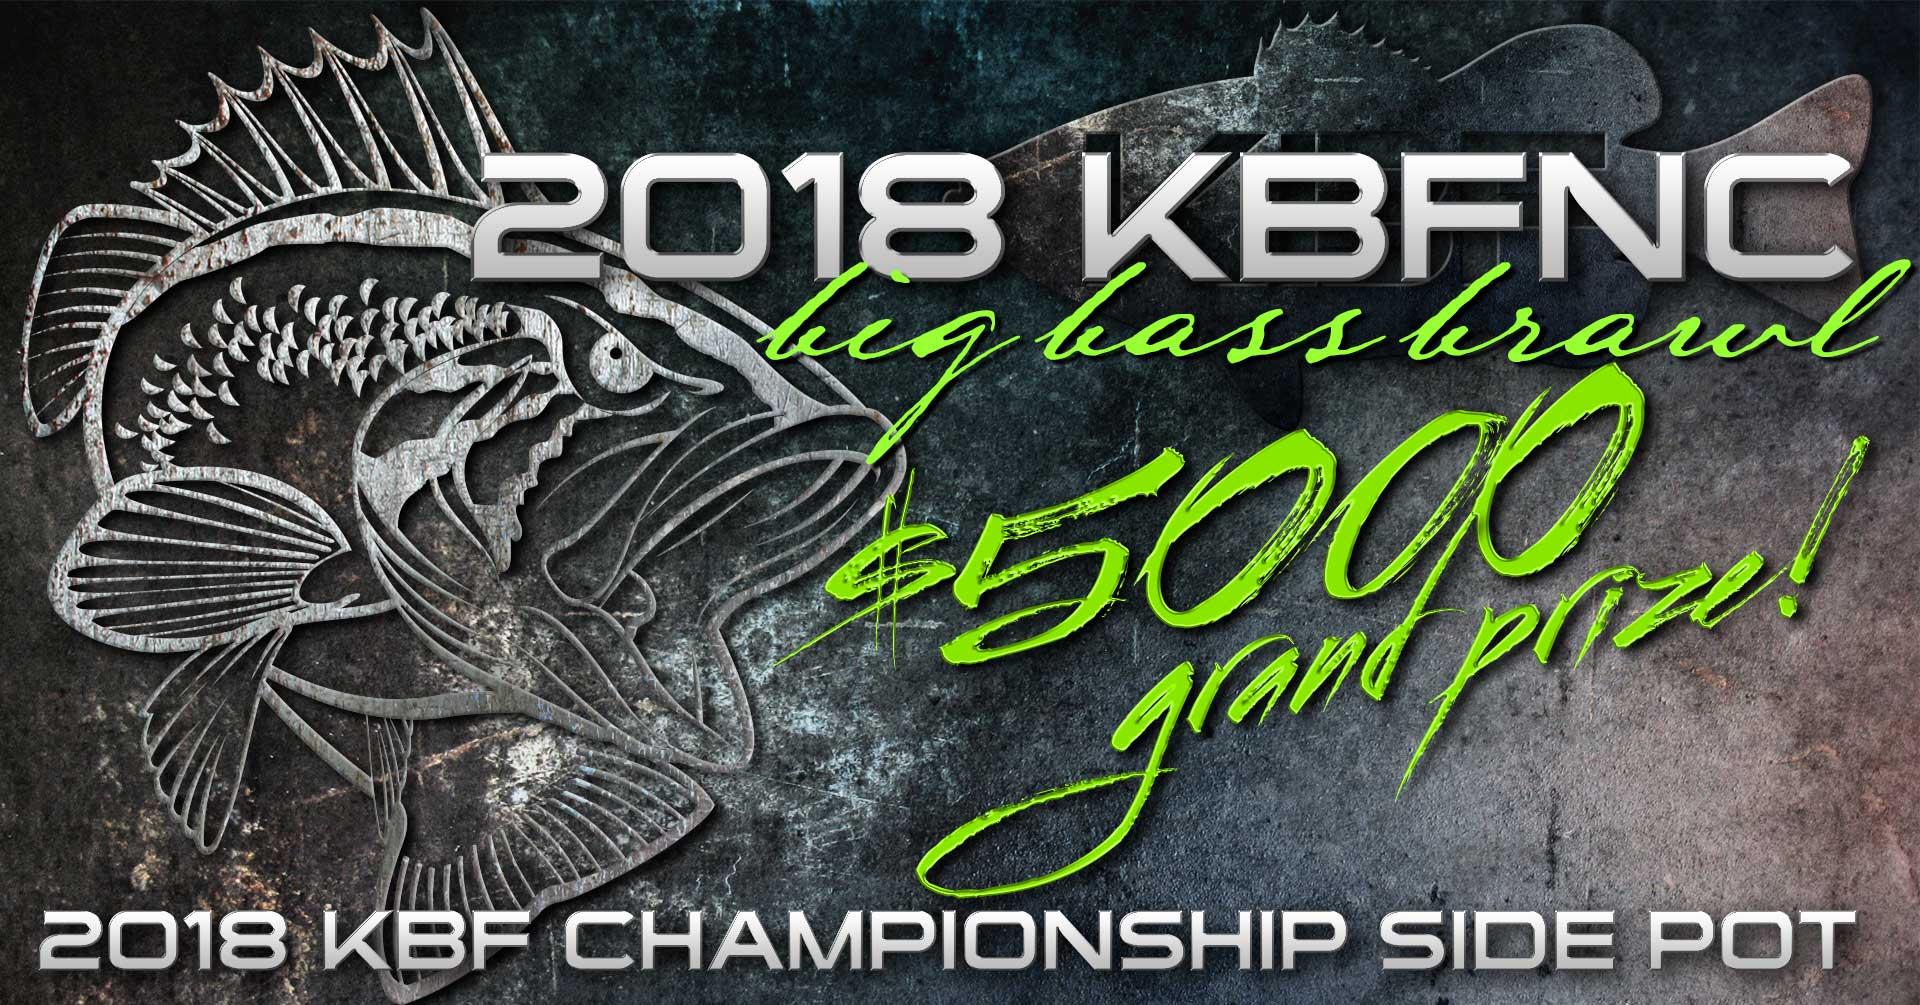 2018 KBFNC Big Bass Brawl